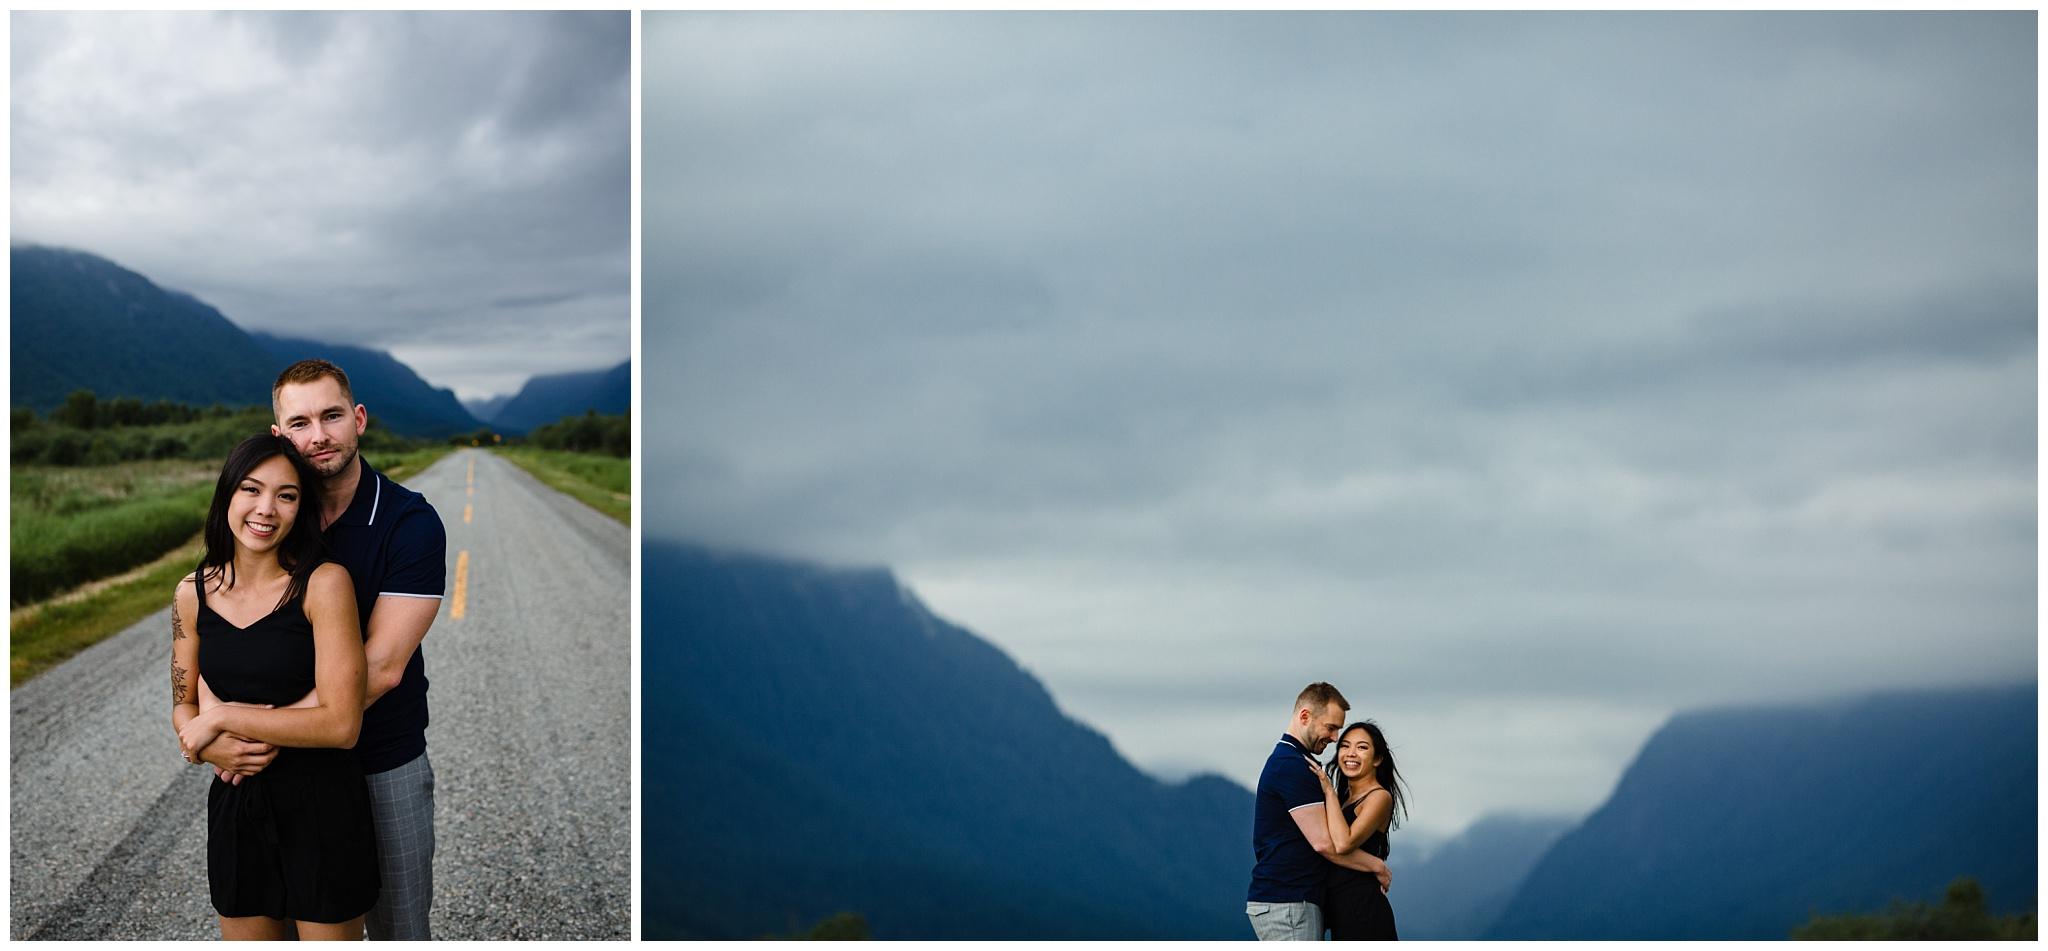 Pitt Lake Engagement Photos Maple Ridge Candid Fun Romantic Couples Photography_0017.jpg